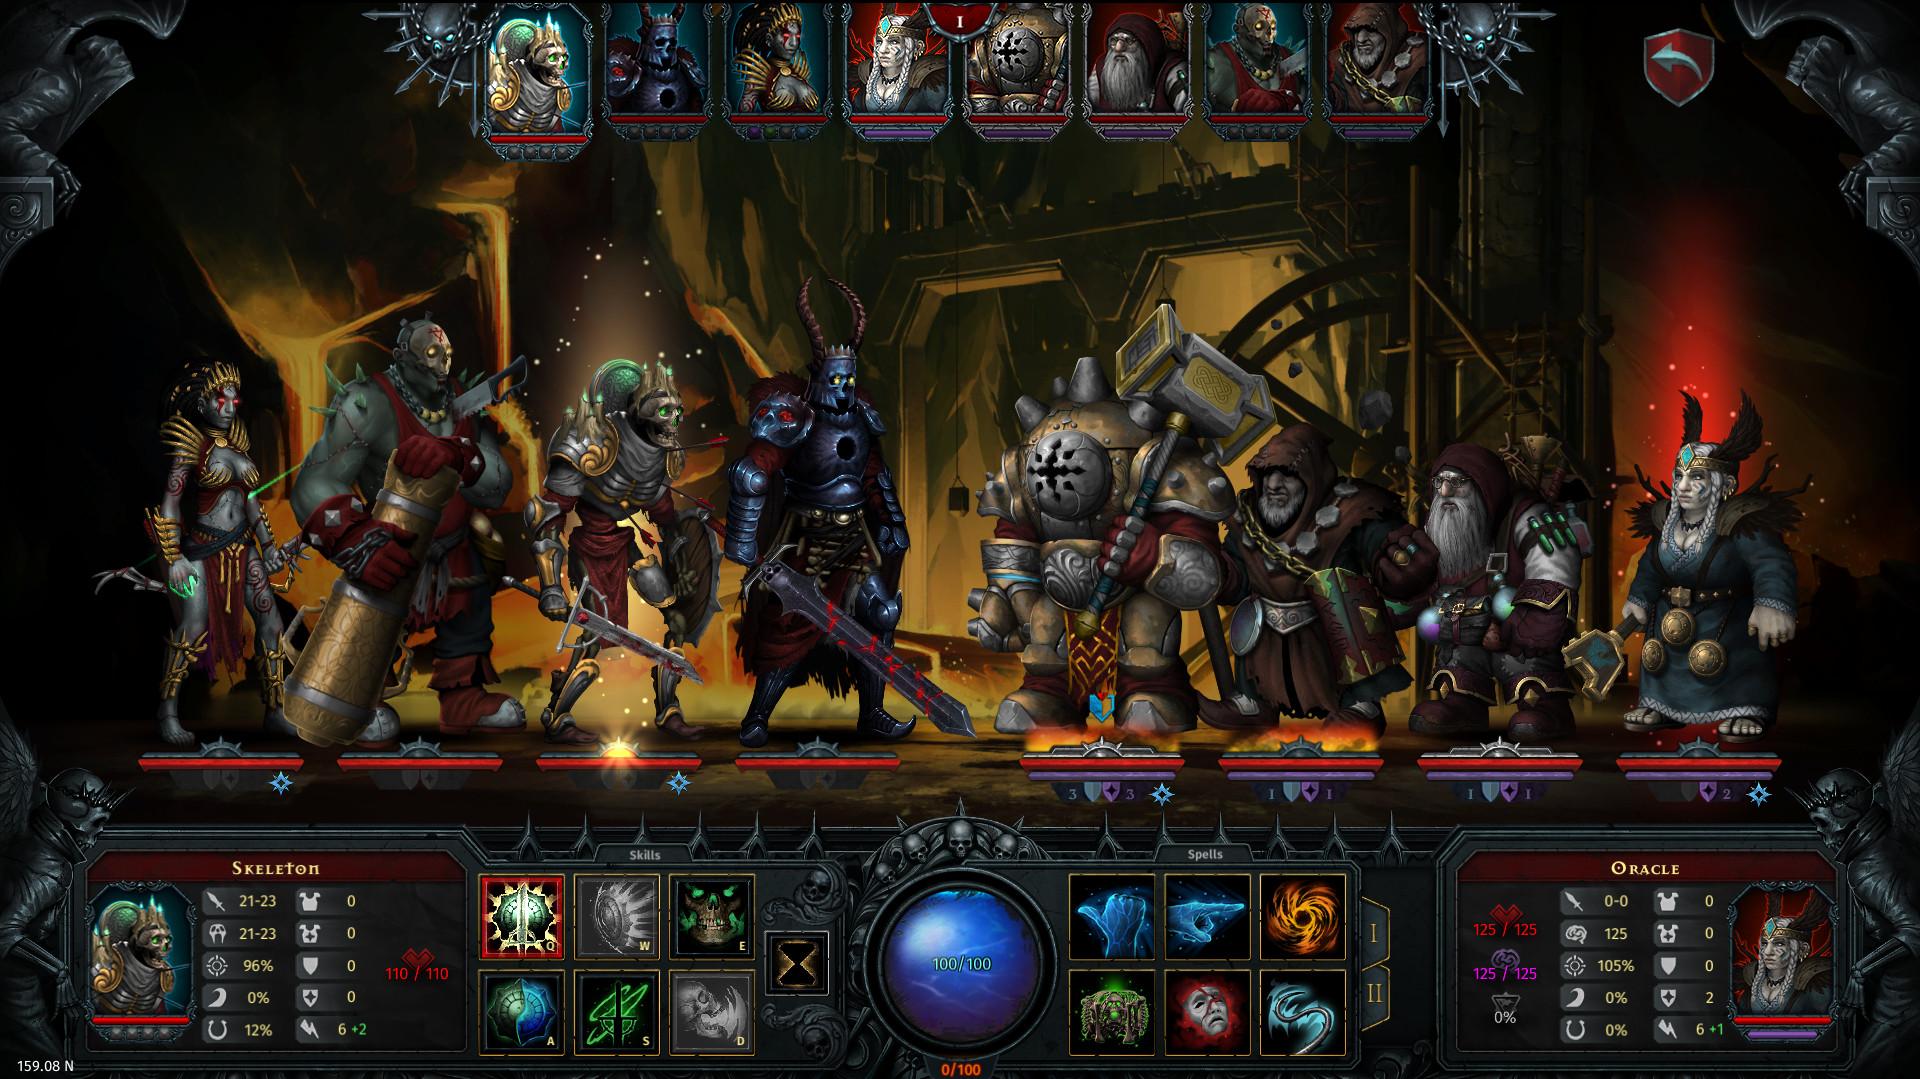 Iratus: Lord of the Dead - Supporter Pack Mac 破解版 伊拉图斯:死之主 怪物版的暗黑地牢